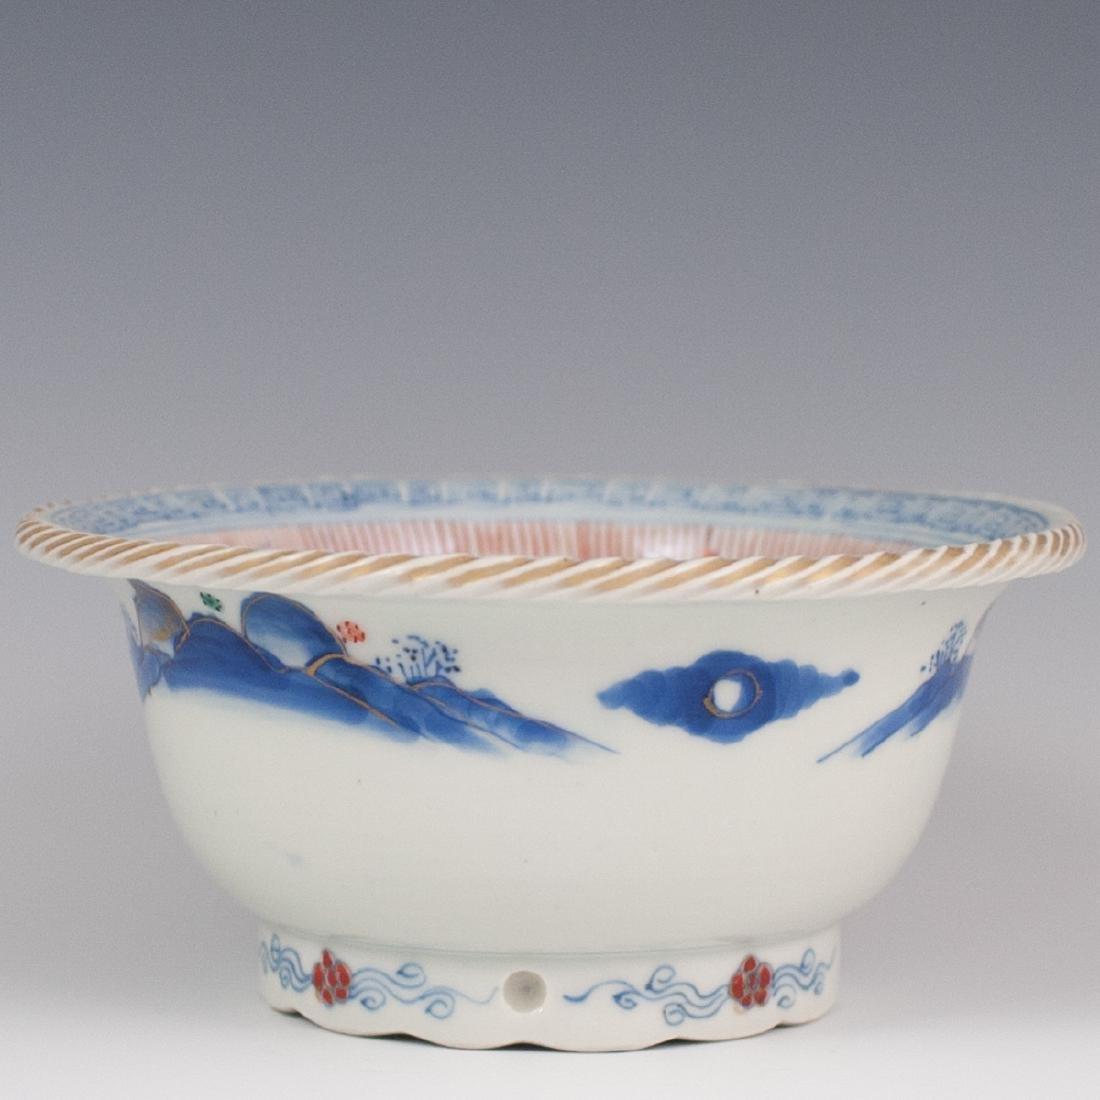 Japanese Porcelain Imari Rice Bowl - 4